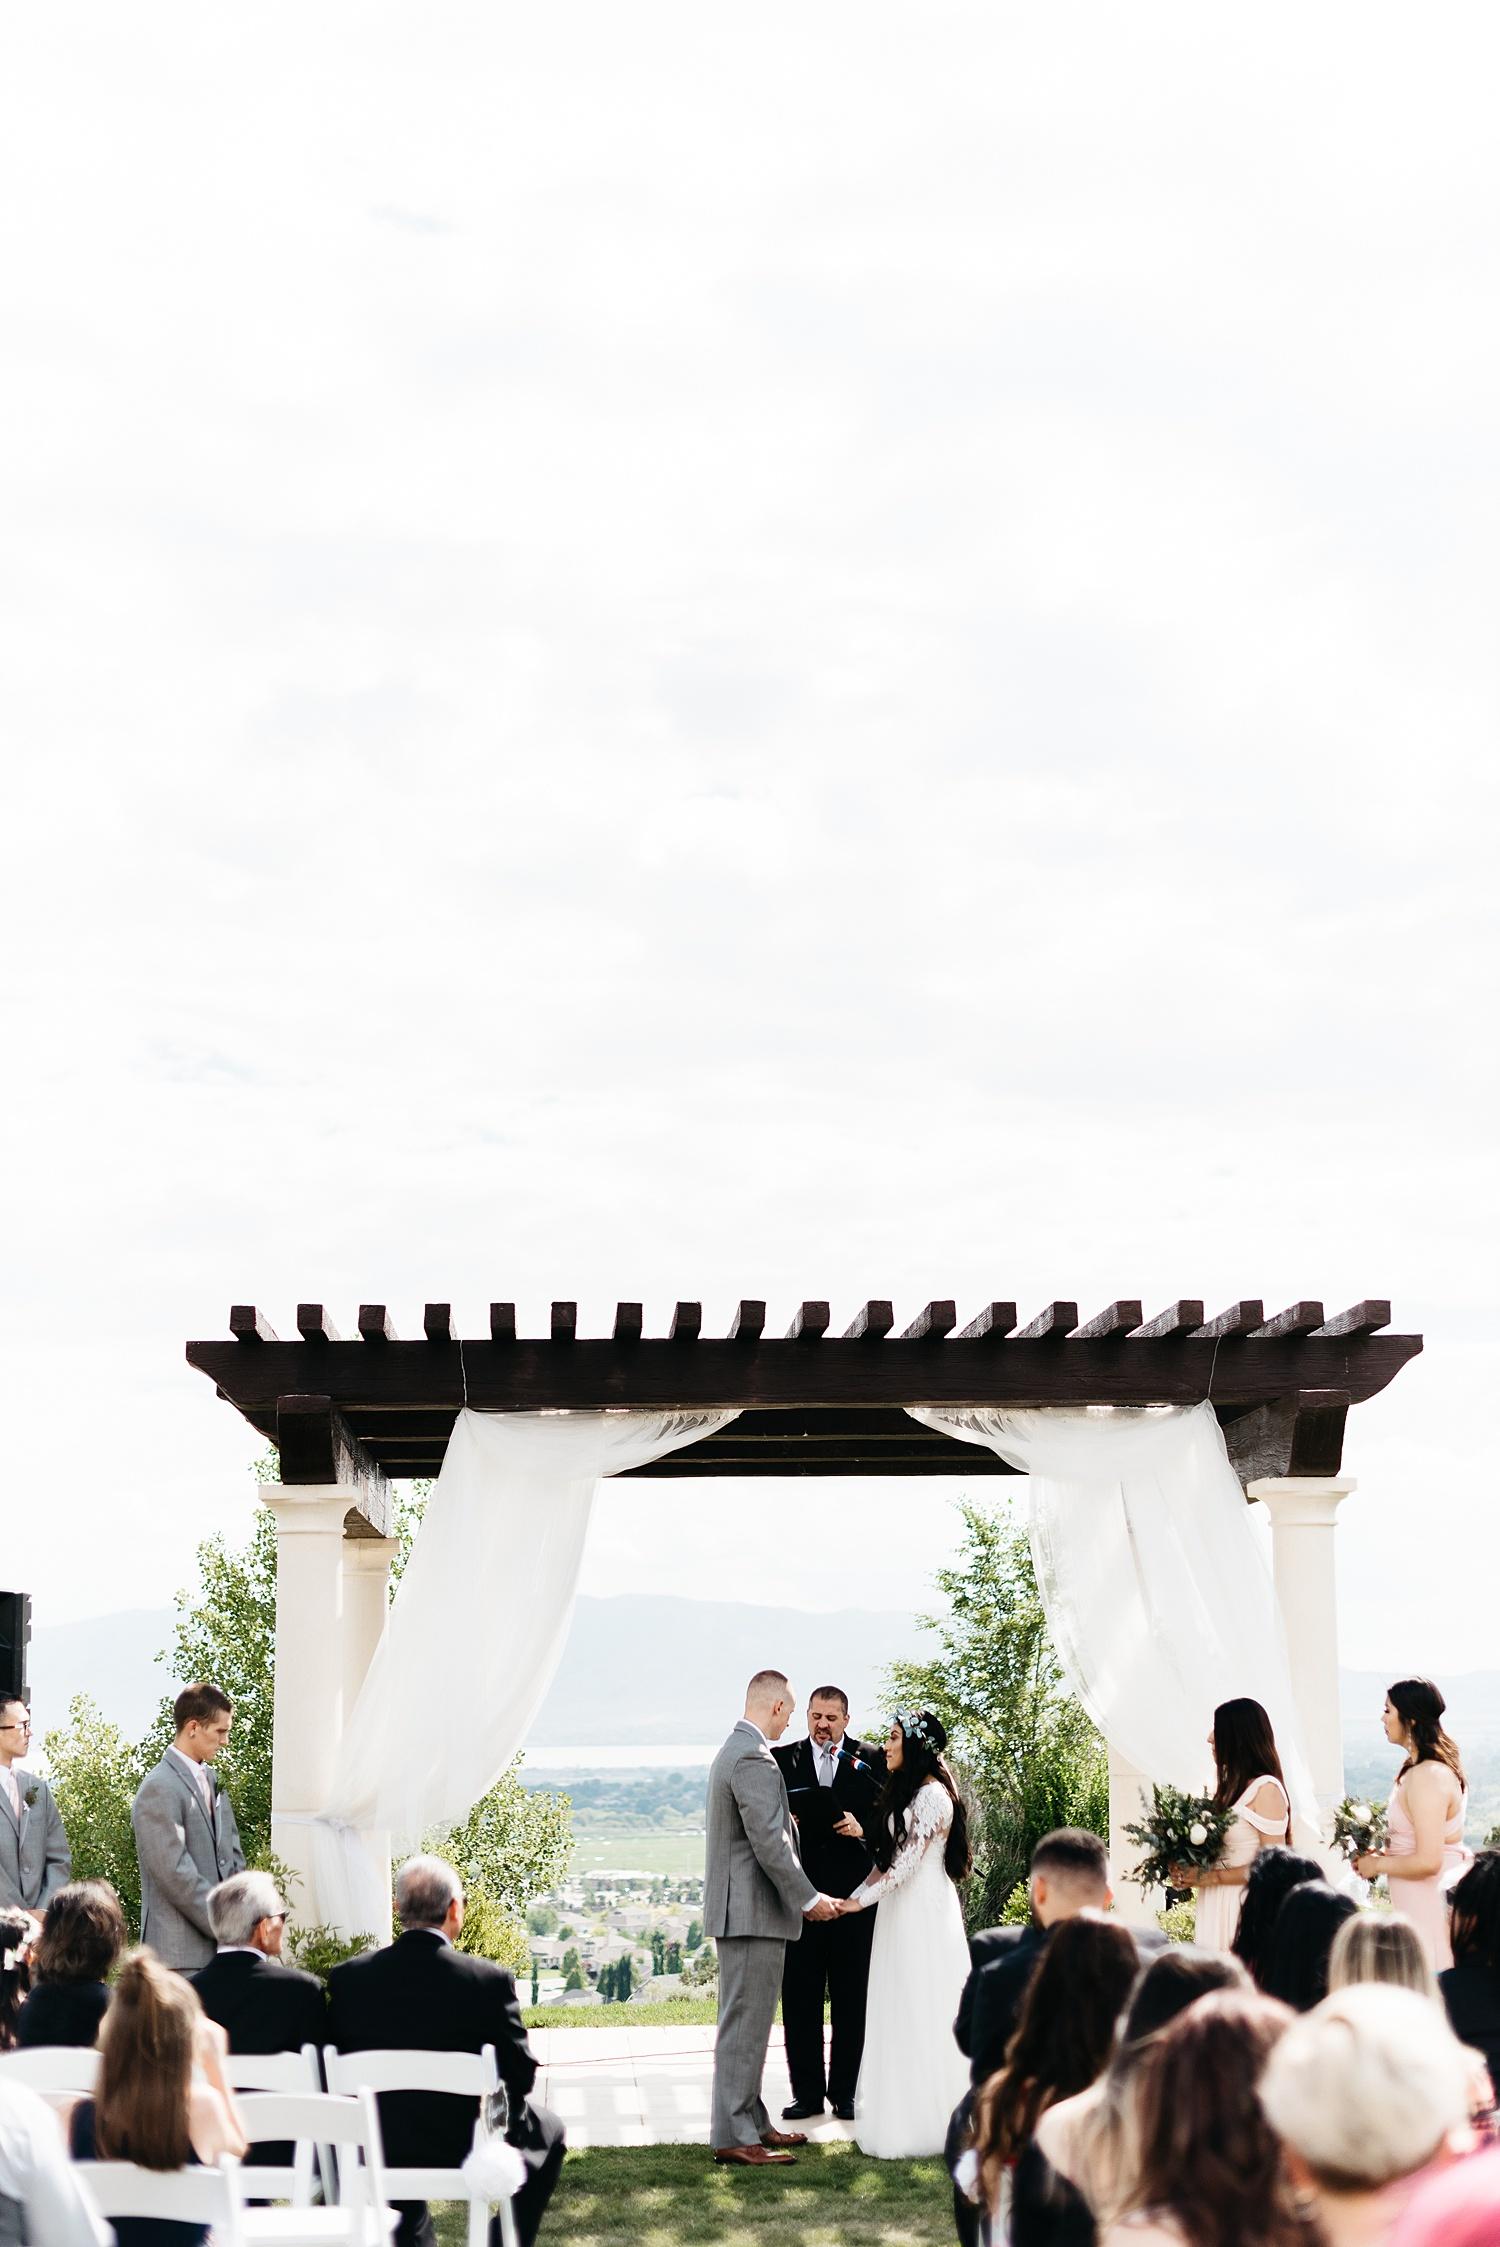 Zandra Barriga Photo - Darian and Colton Wedding_0023.jpg